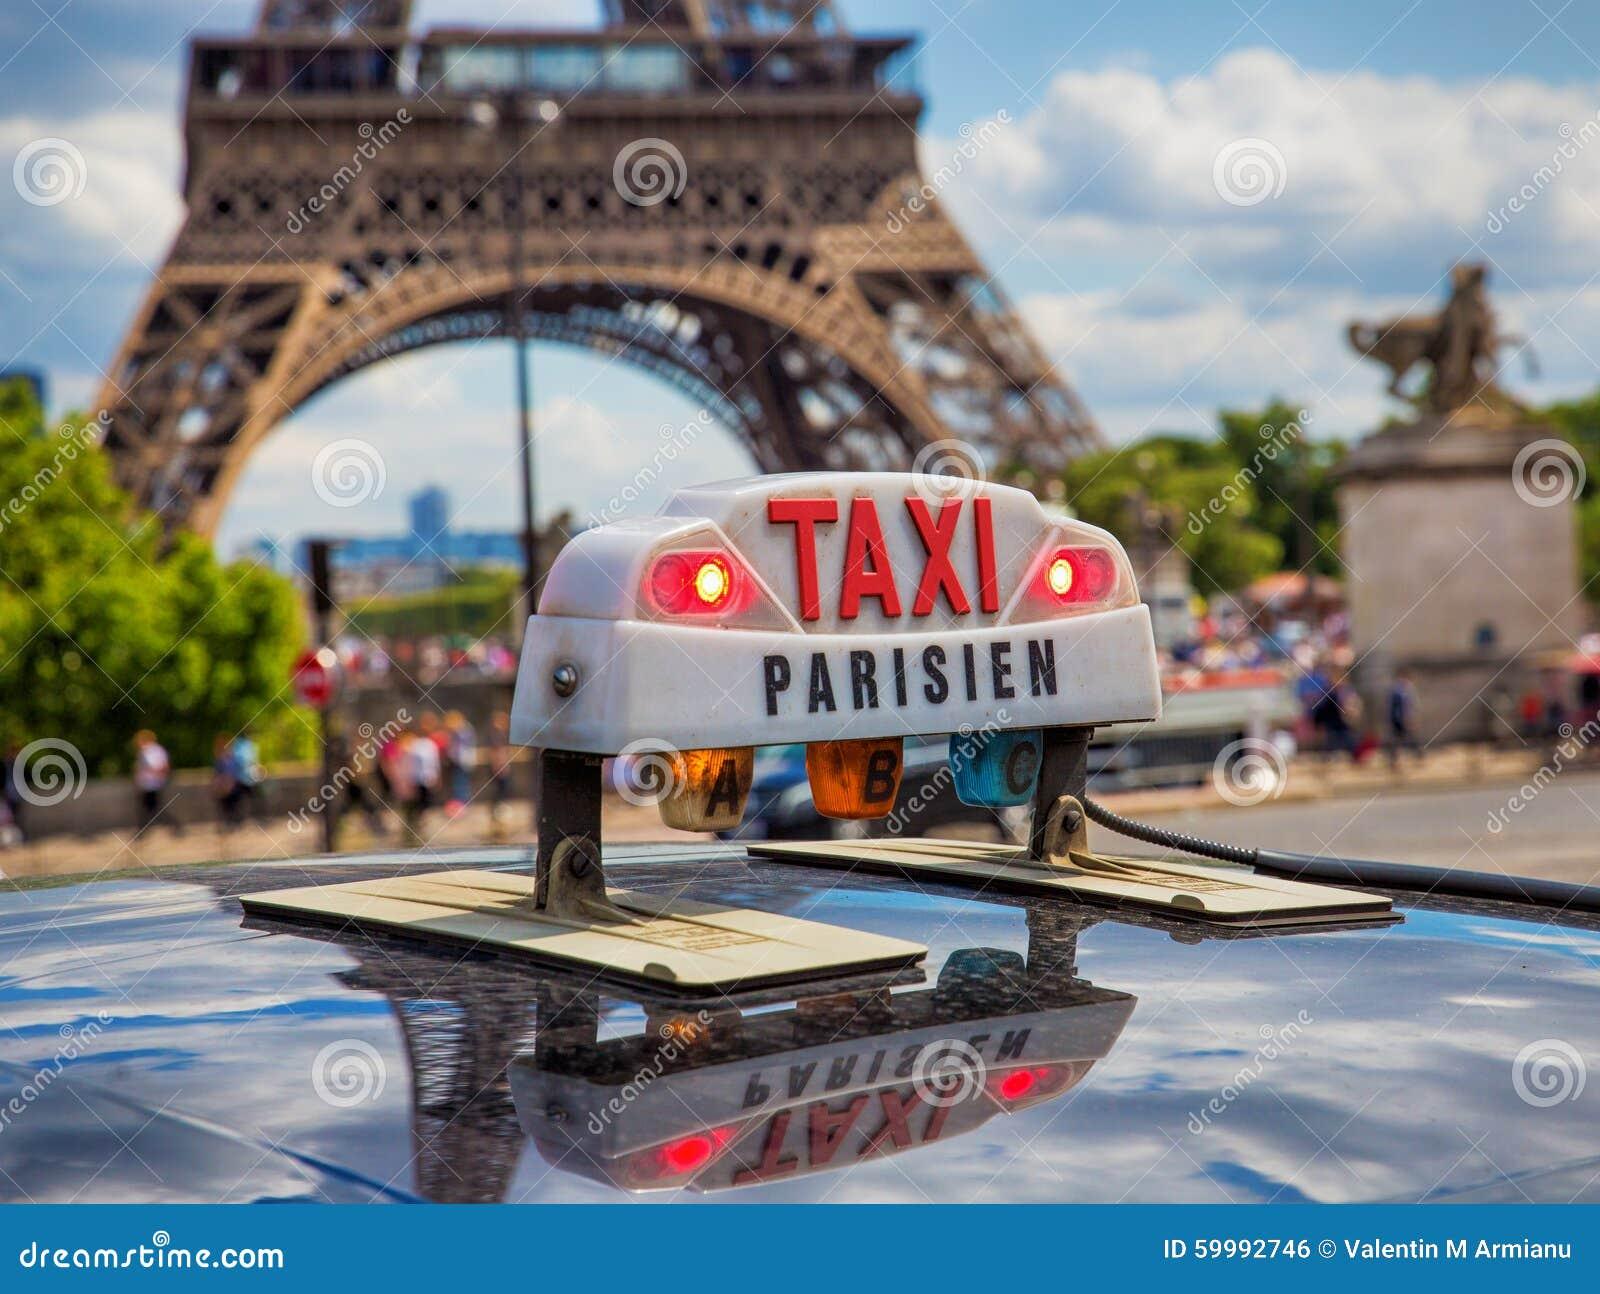 paris taxi near eiffel tower stock photo image 59992746. Black Bedroom Furniture Sets. Home Design Ideas